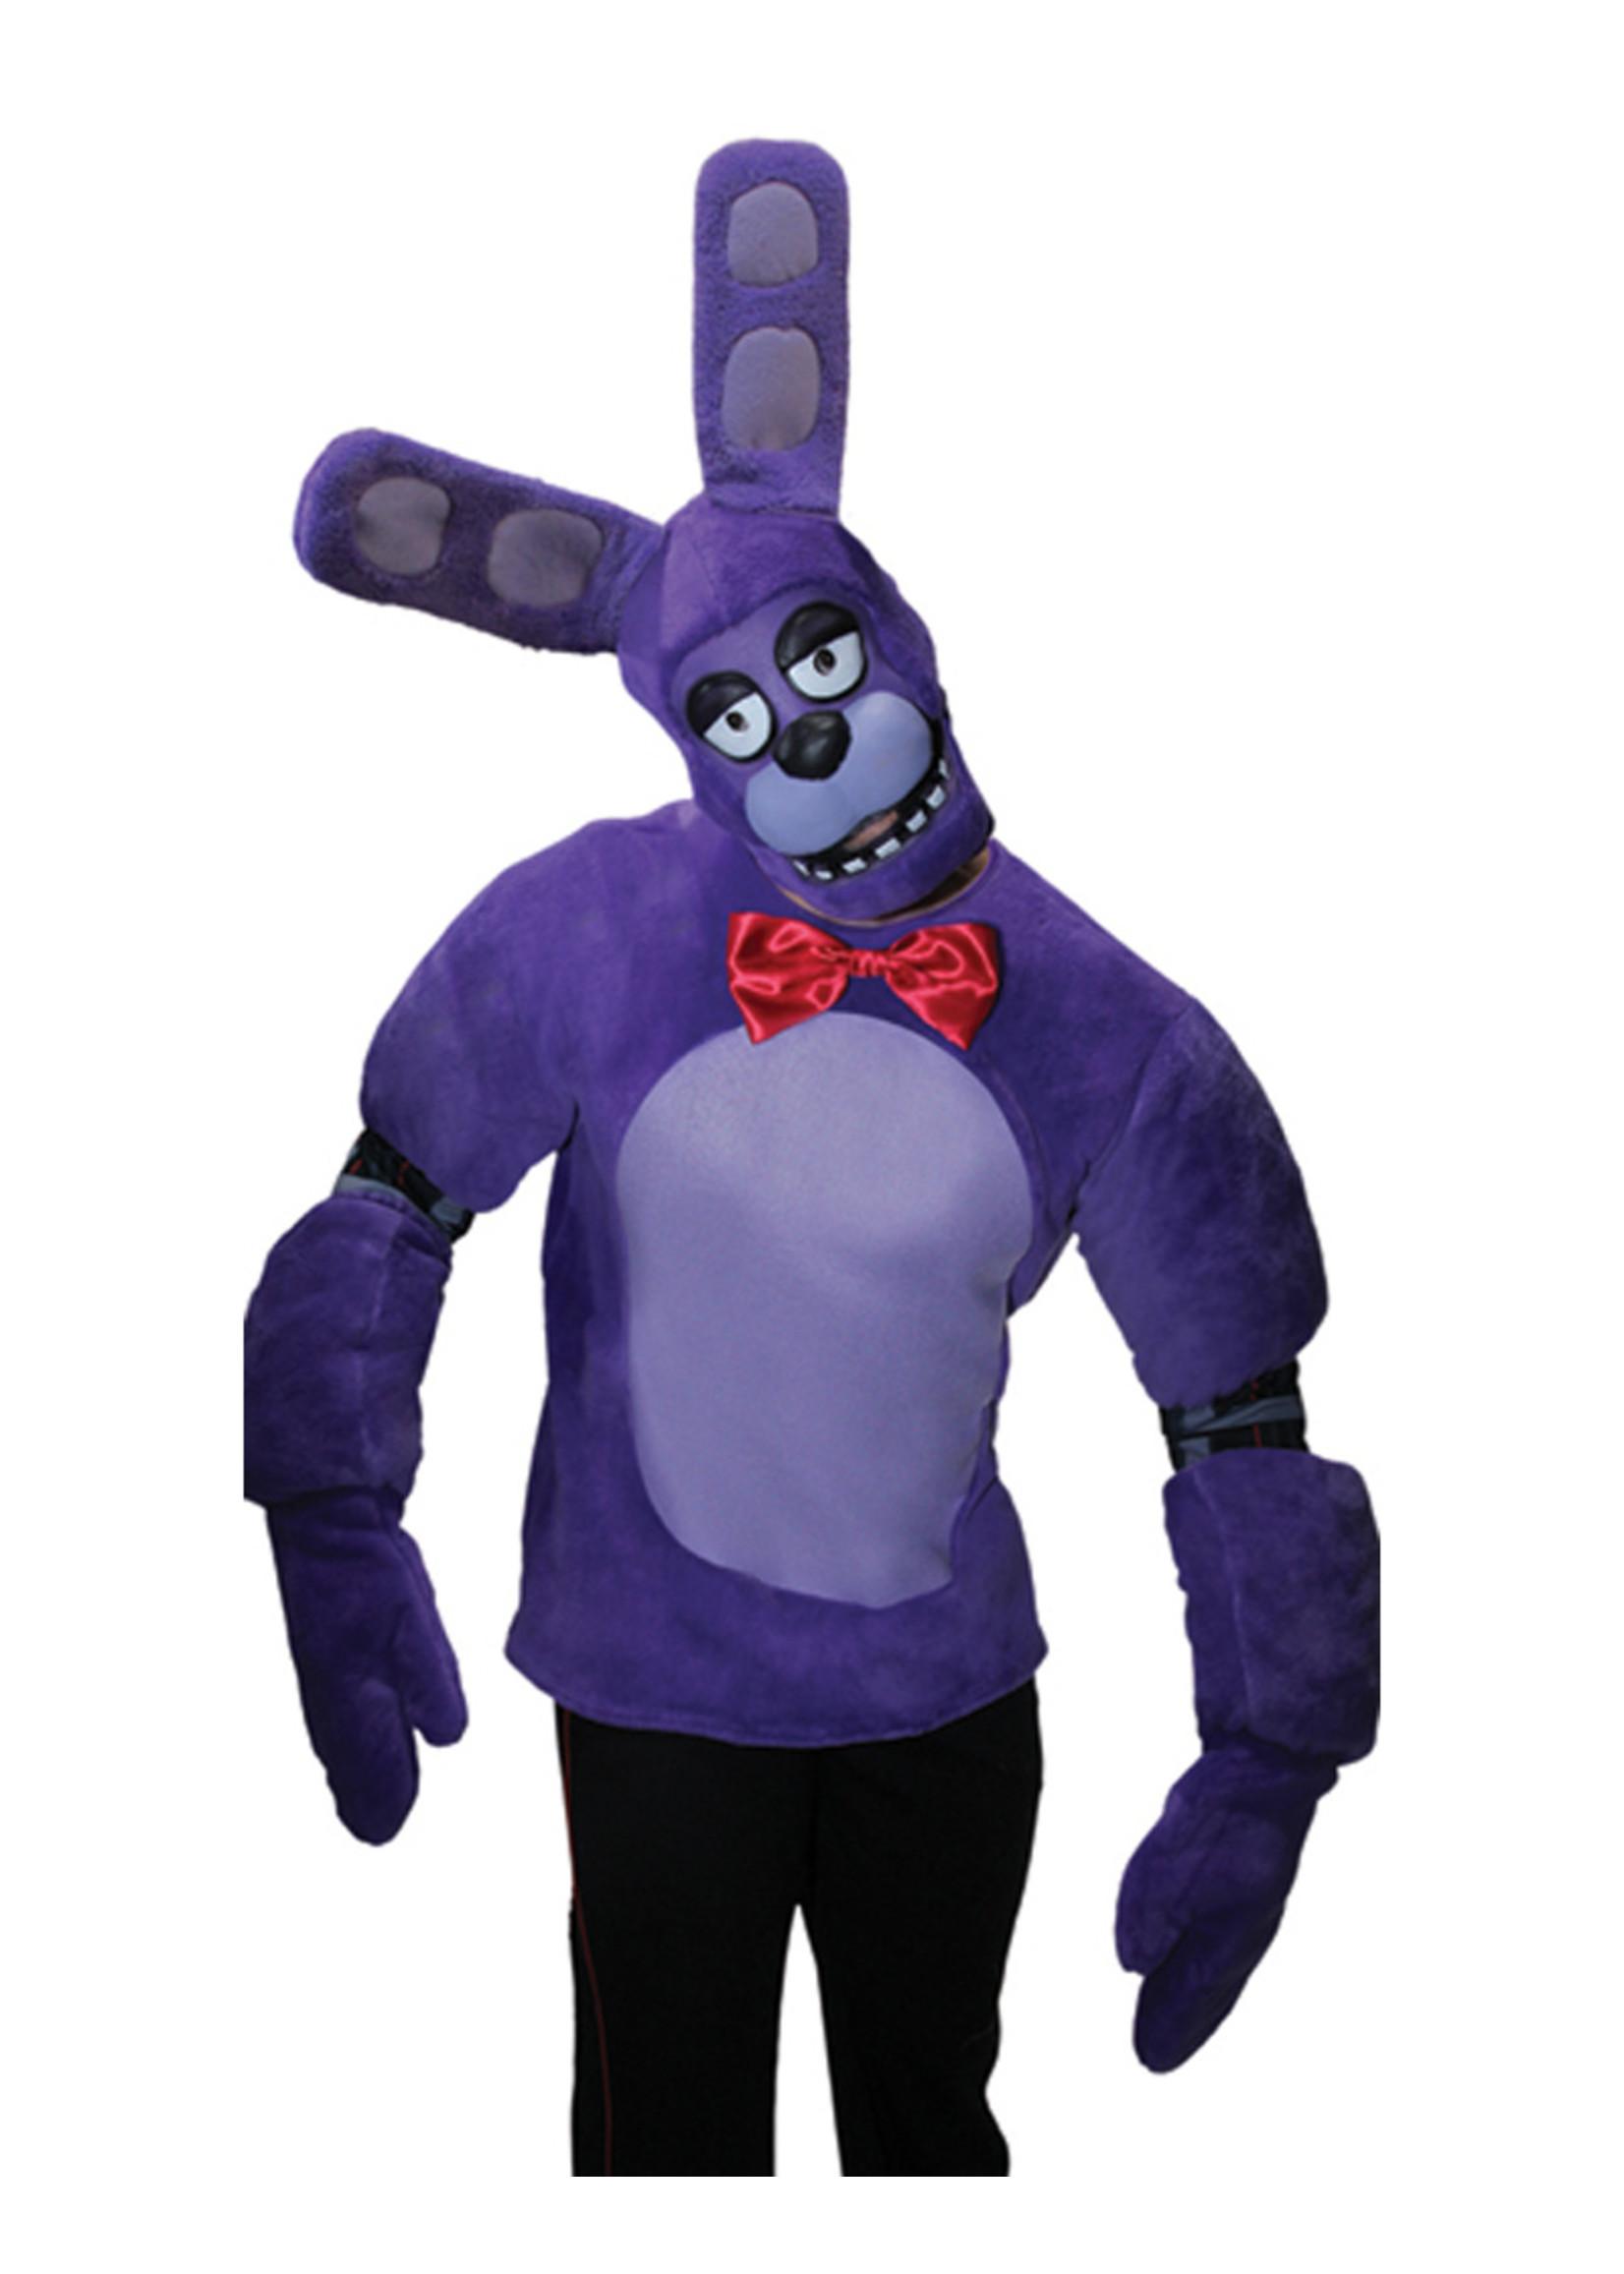 Bonnie - Five Nights at Freddy's Costume - Men's